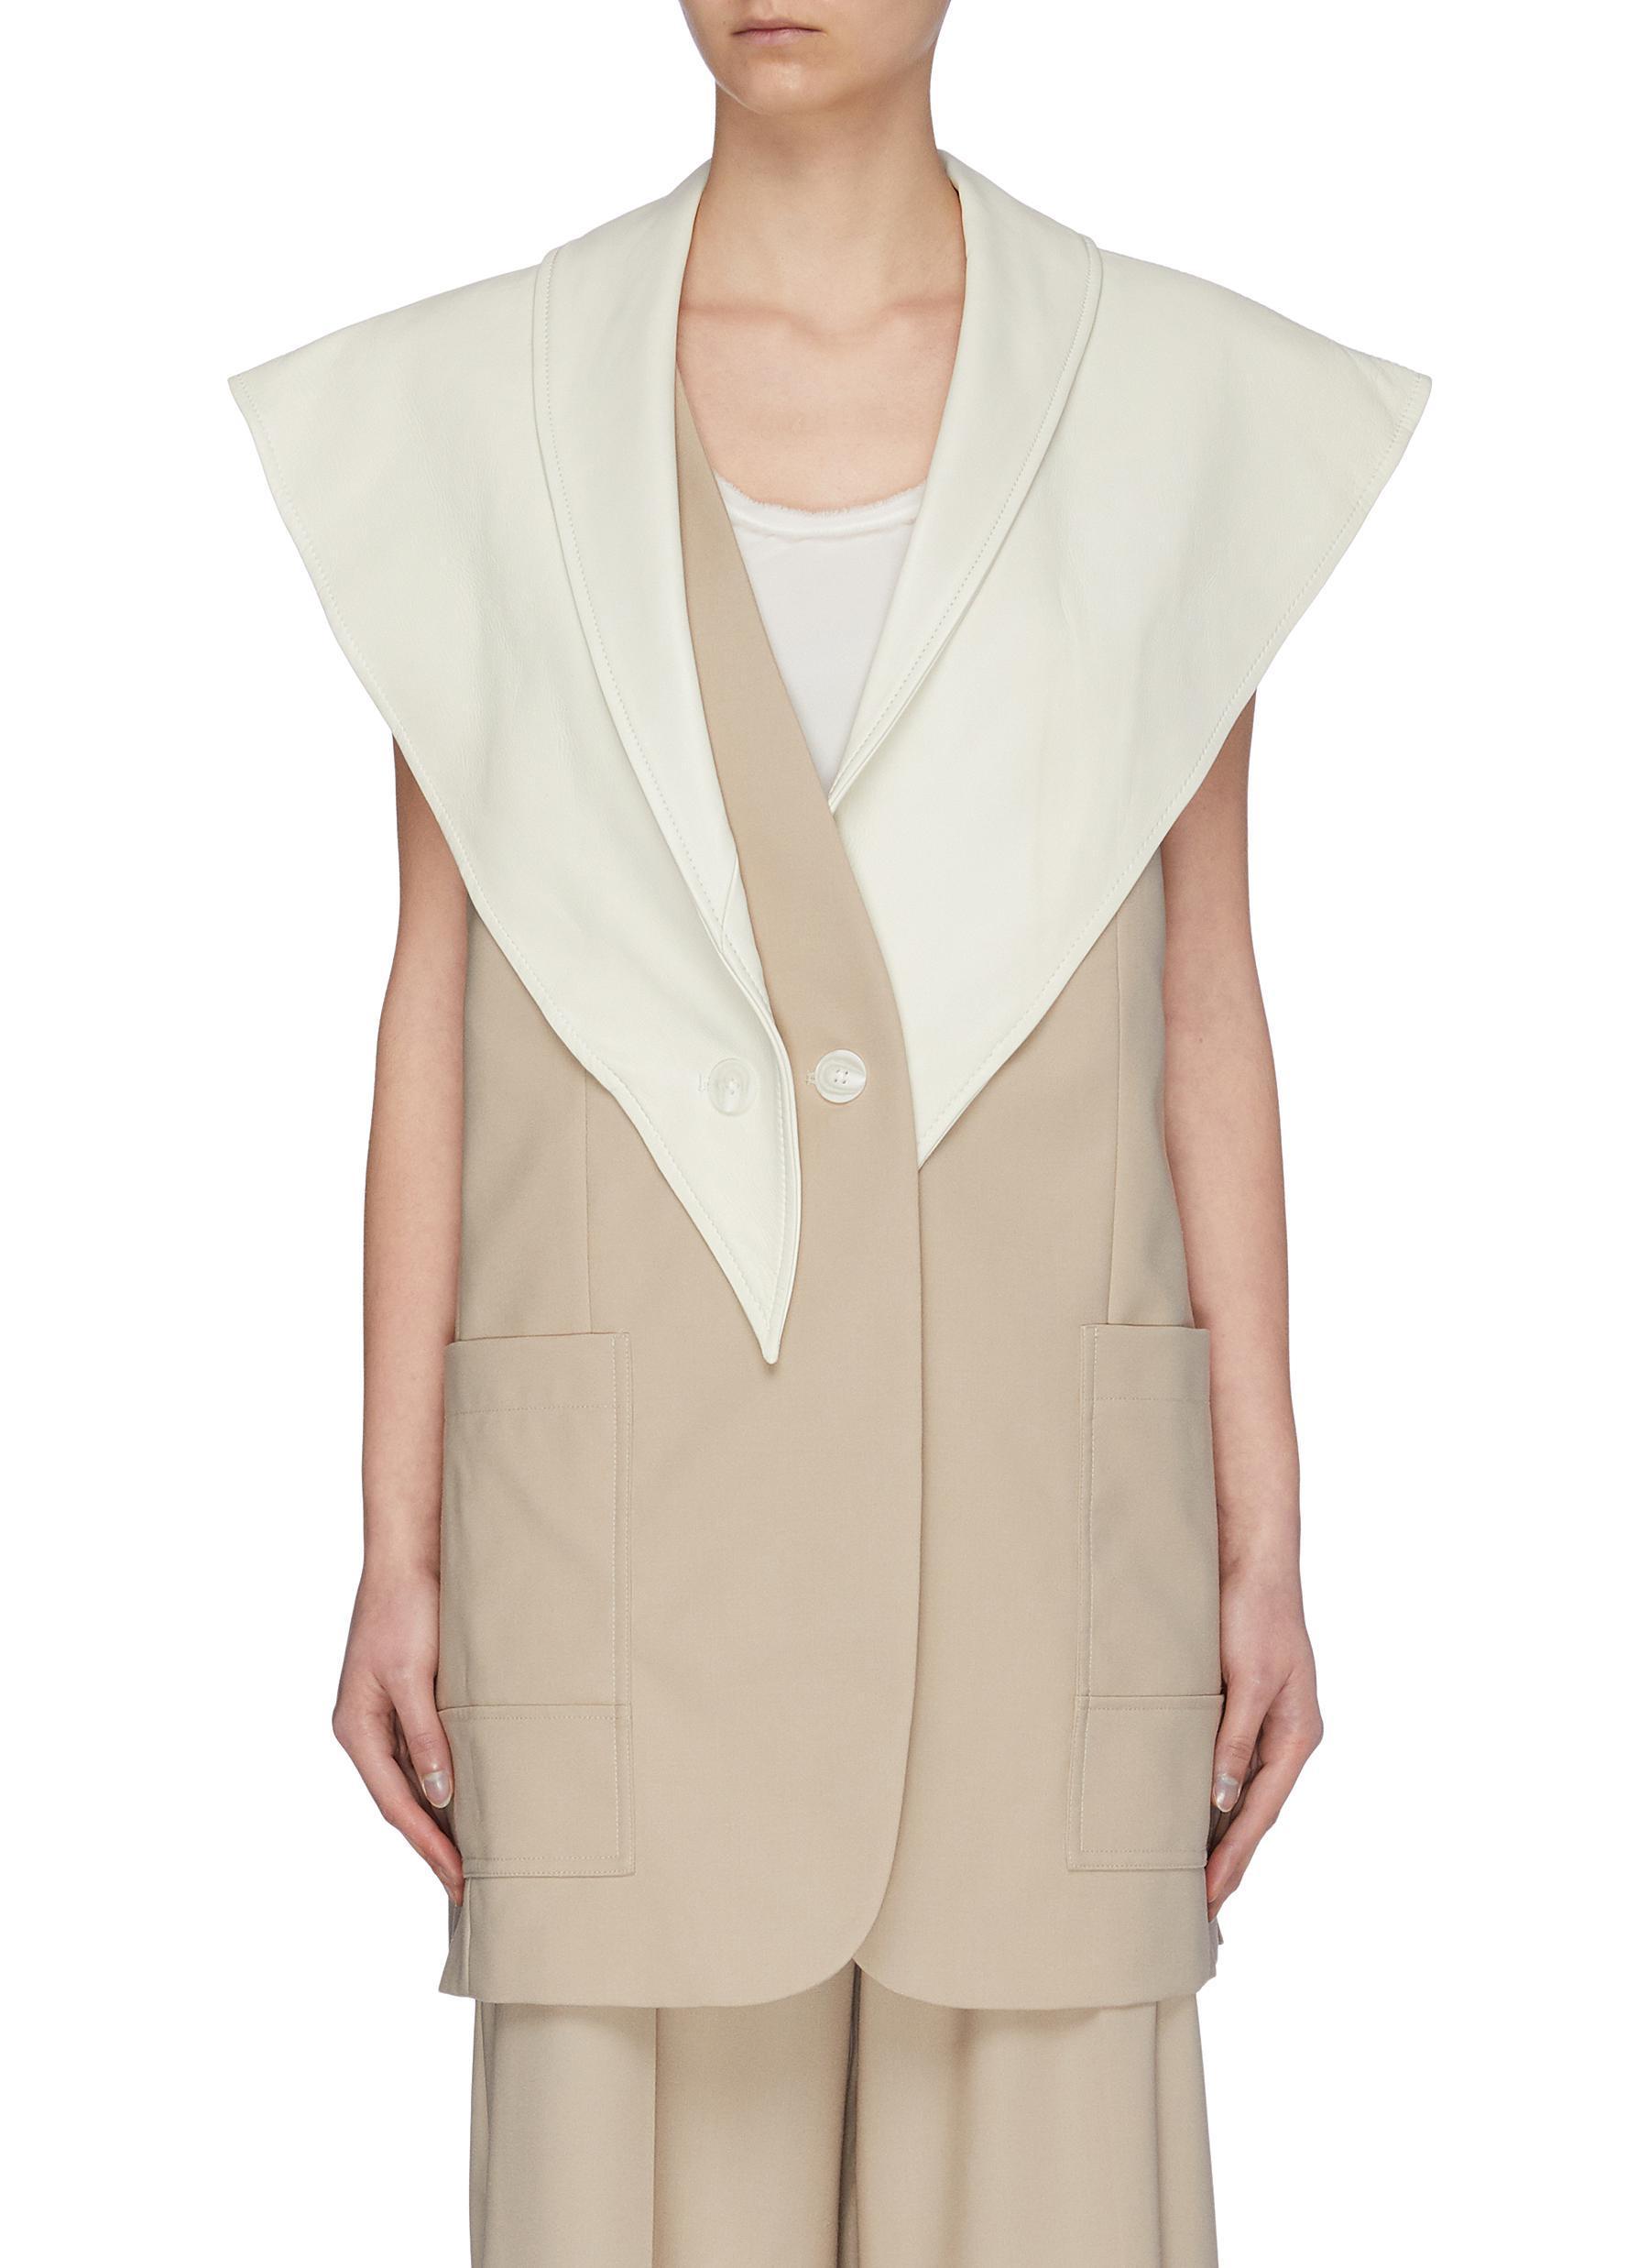 BEETTY Long Scarf Python Grain Snake Lightweight Large Soft Scarves Lady Shawl Chiffon Silk Wrap